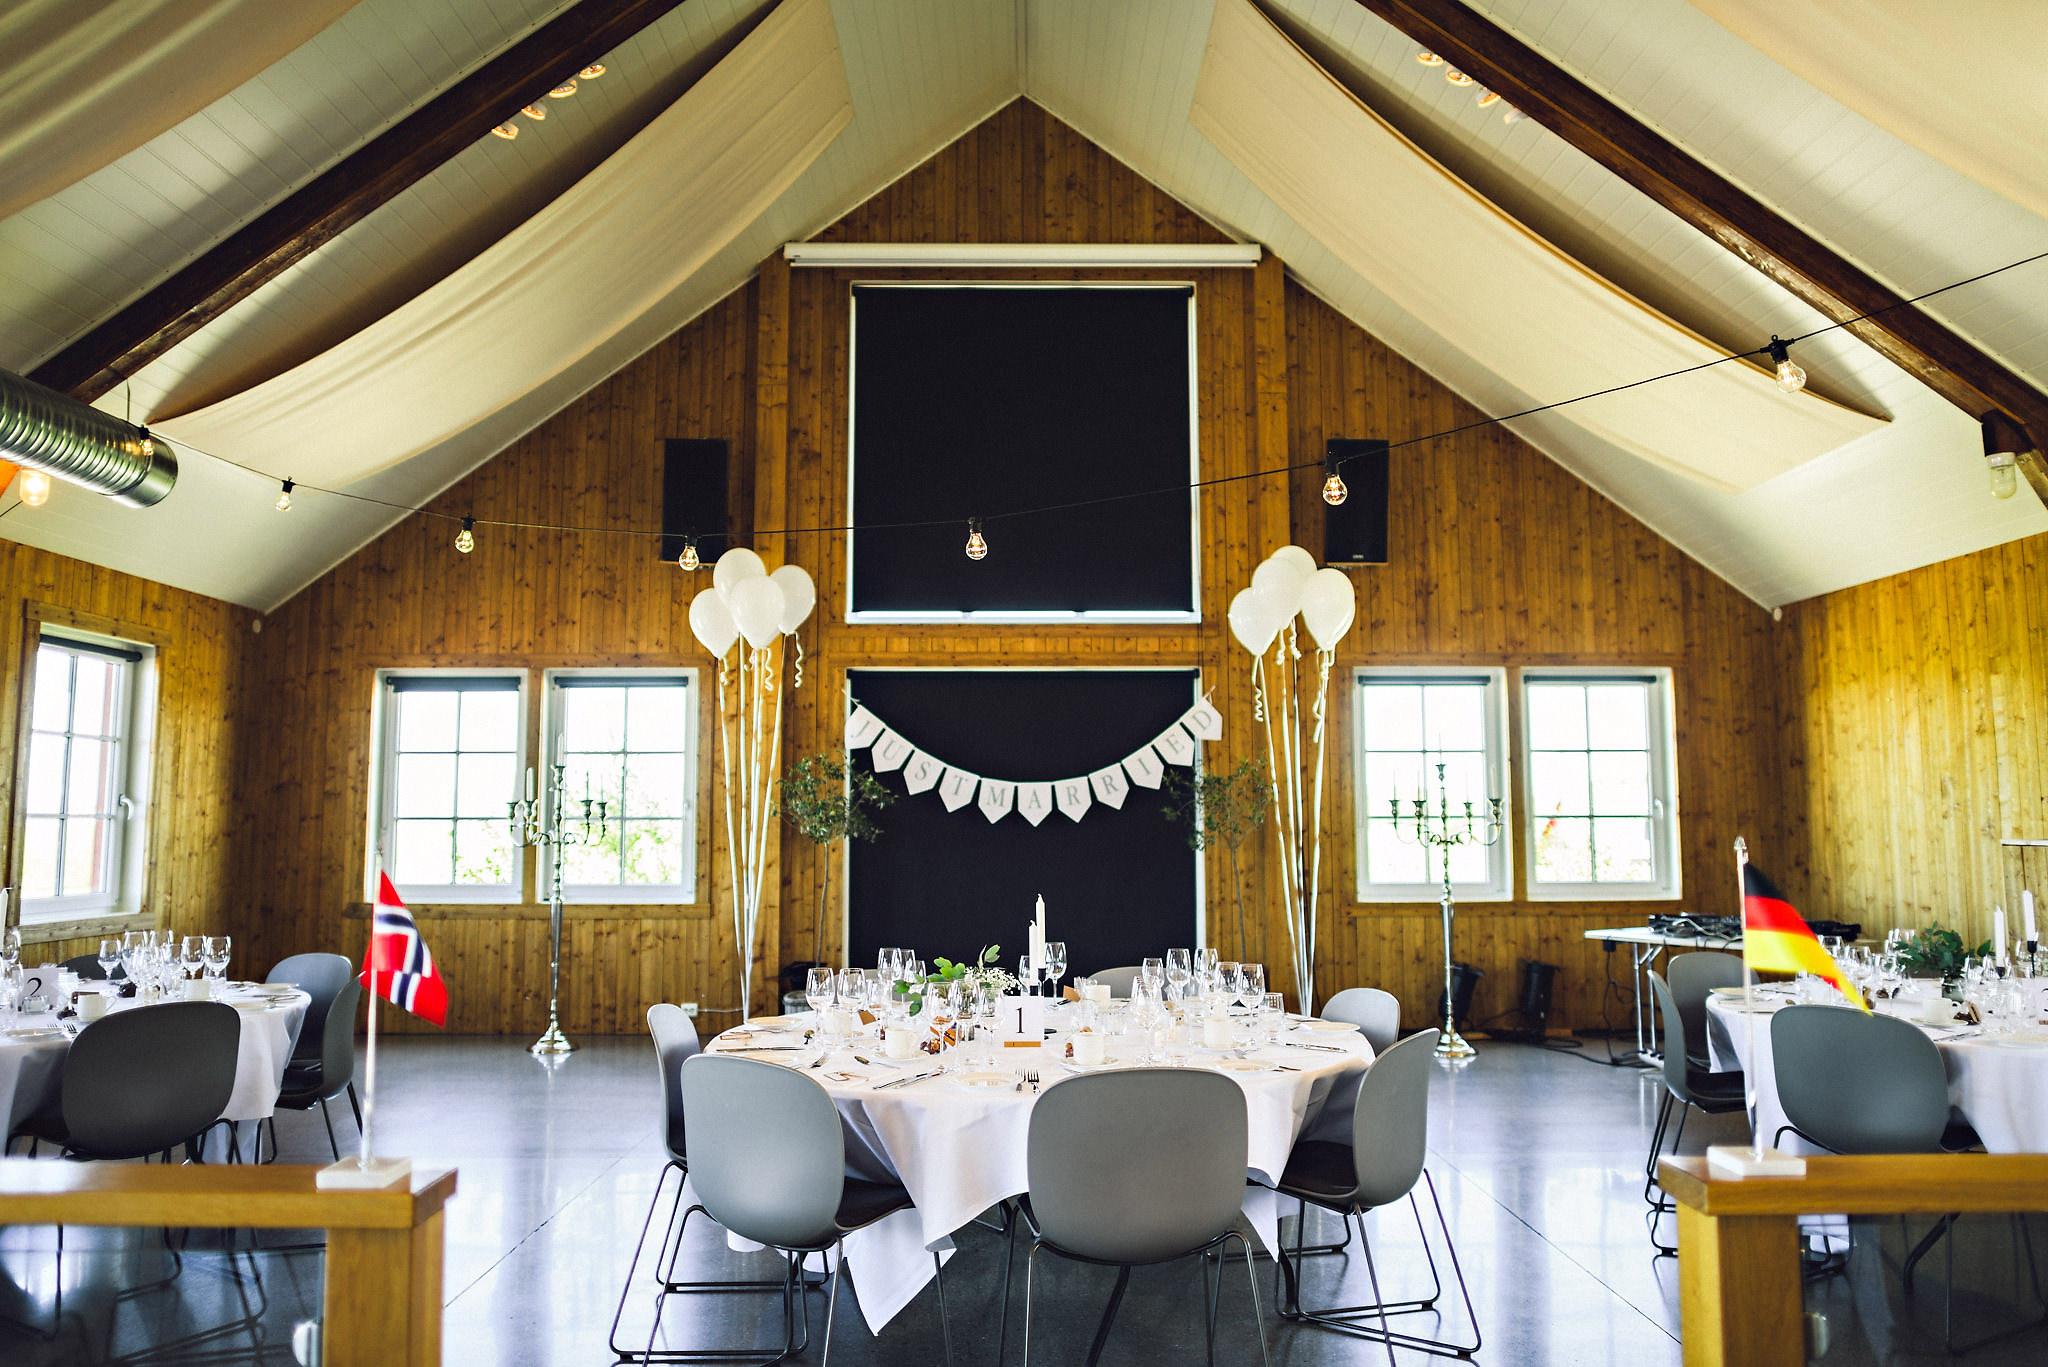 Bryllup på Solastranden Gård fotograf Eirik Halvorsen-2.jpg